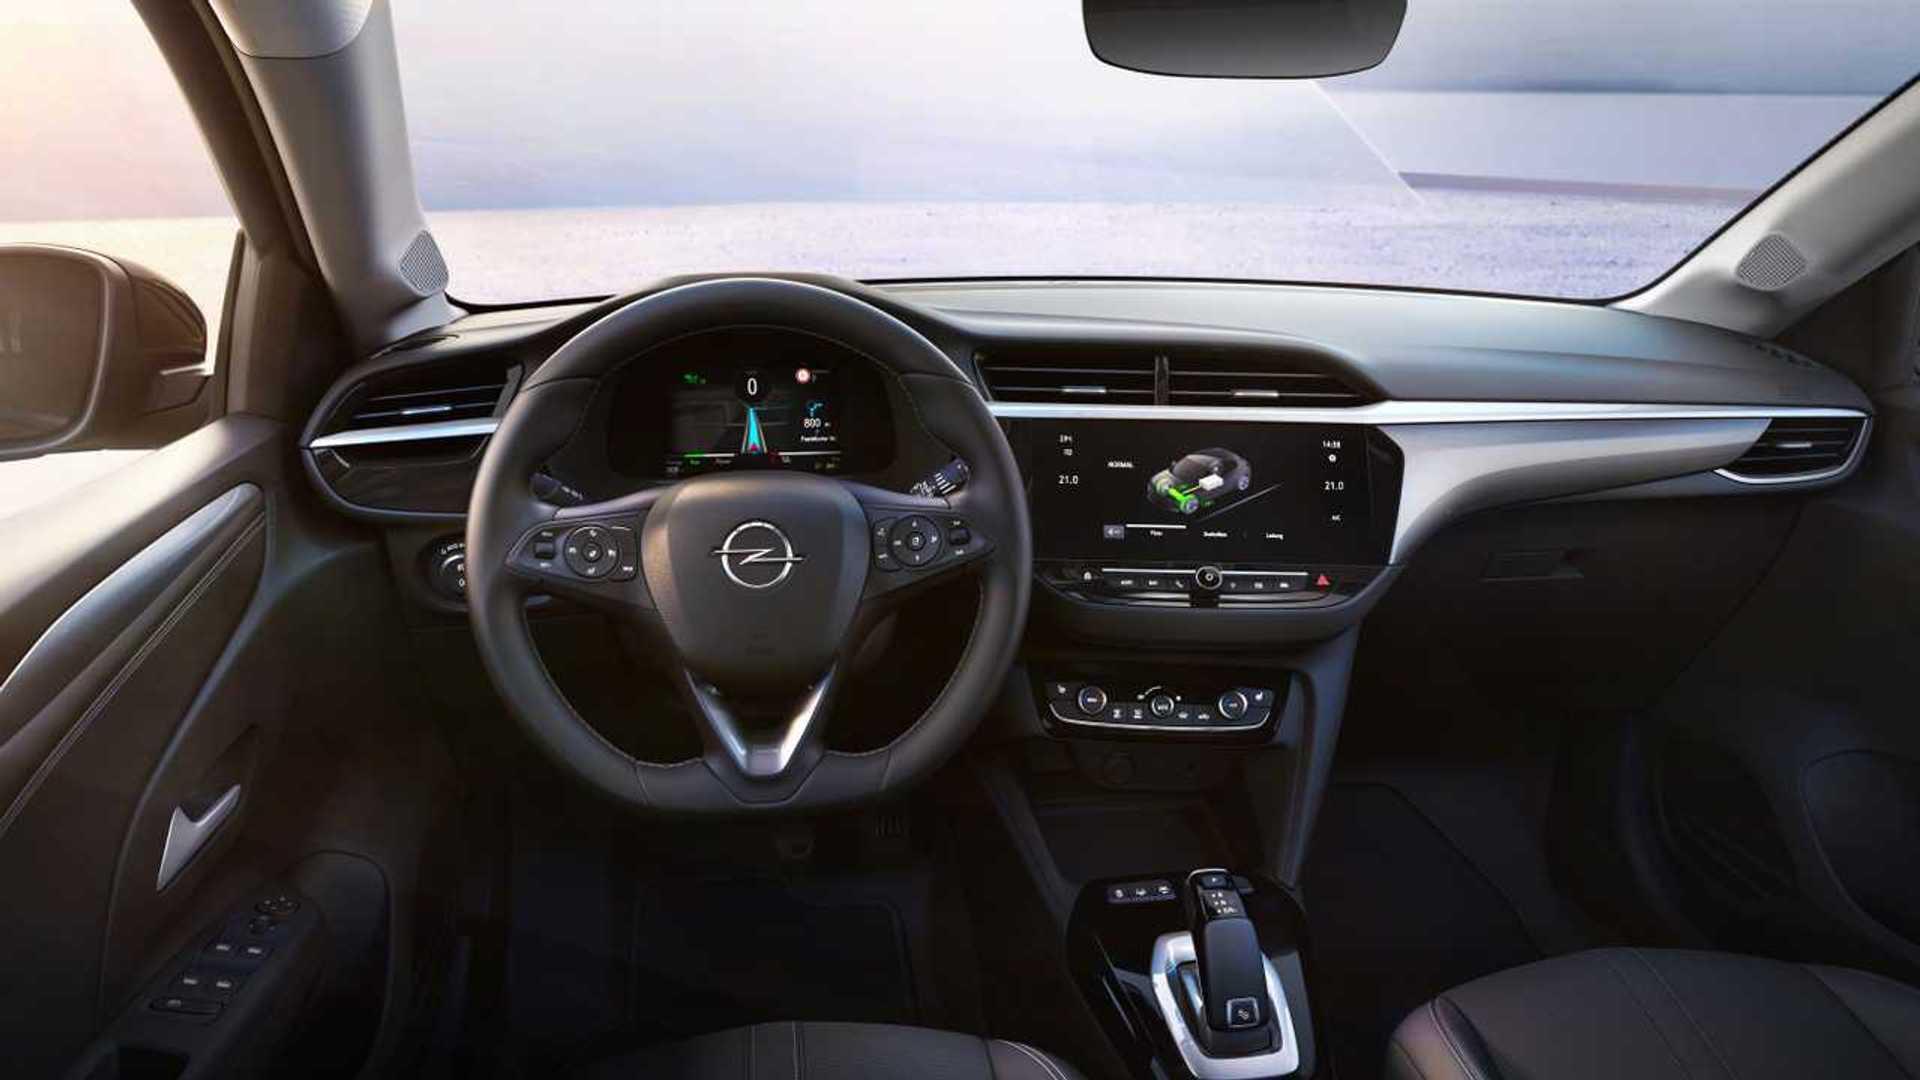 Opel Corsa-e Exterior And Interior Walkthrough By Autogefühl: Video